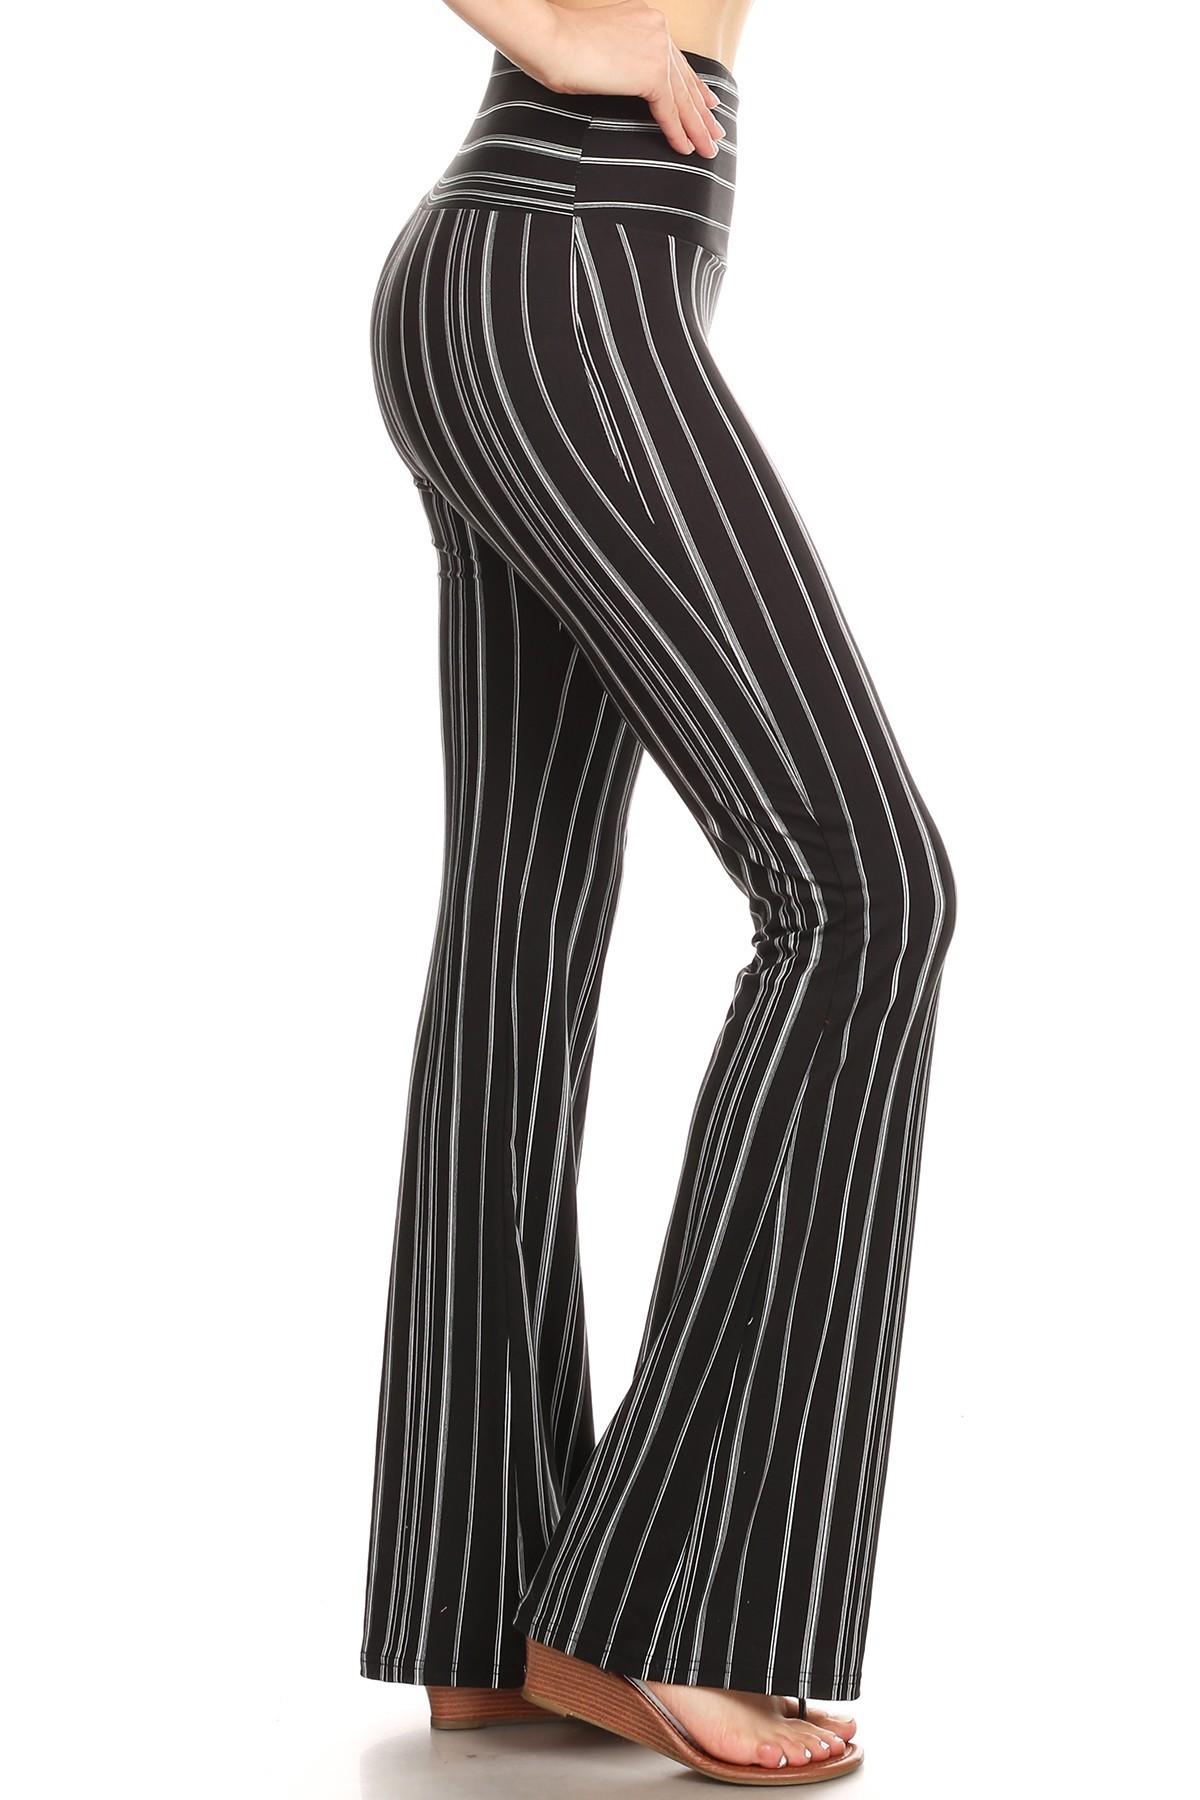 BLACK/WHIET STRIPED PRINT HIGH WAIST BRUSH POLY FLARE PANTS#8FP06-13